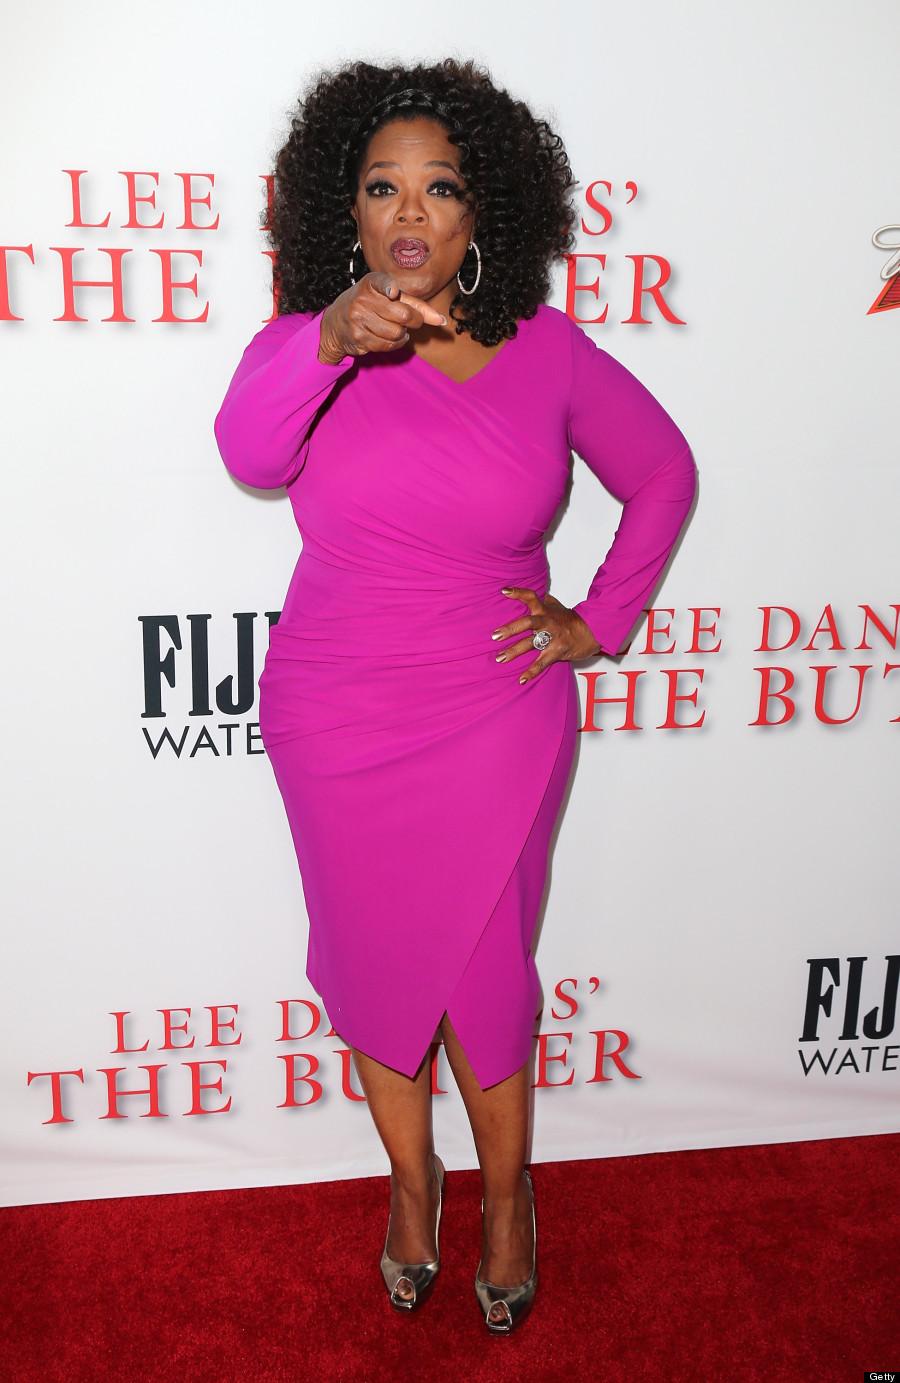 oprah winfrey - Oprah Winfrey Halloween Costume